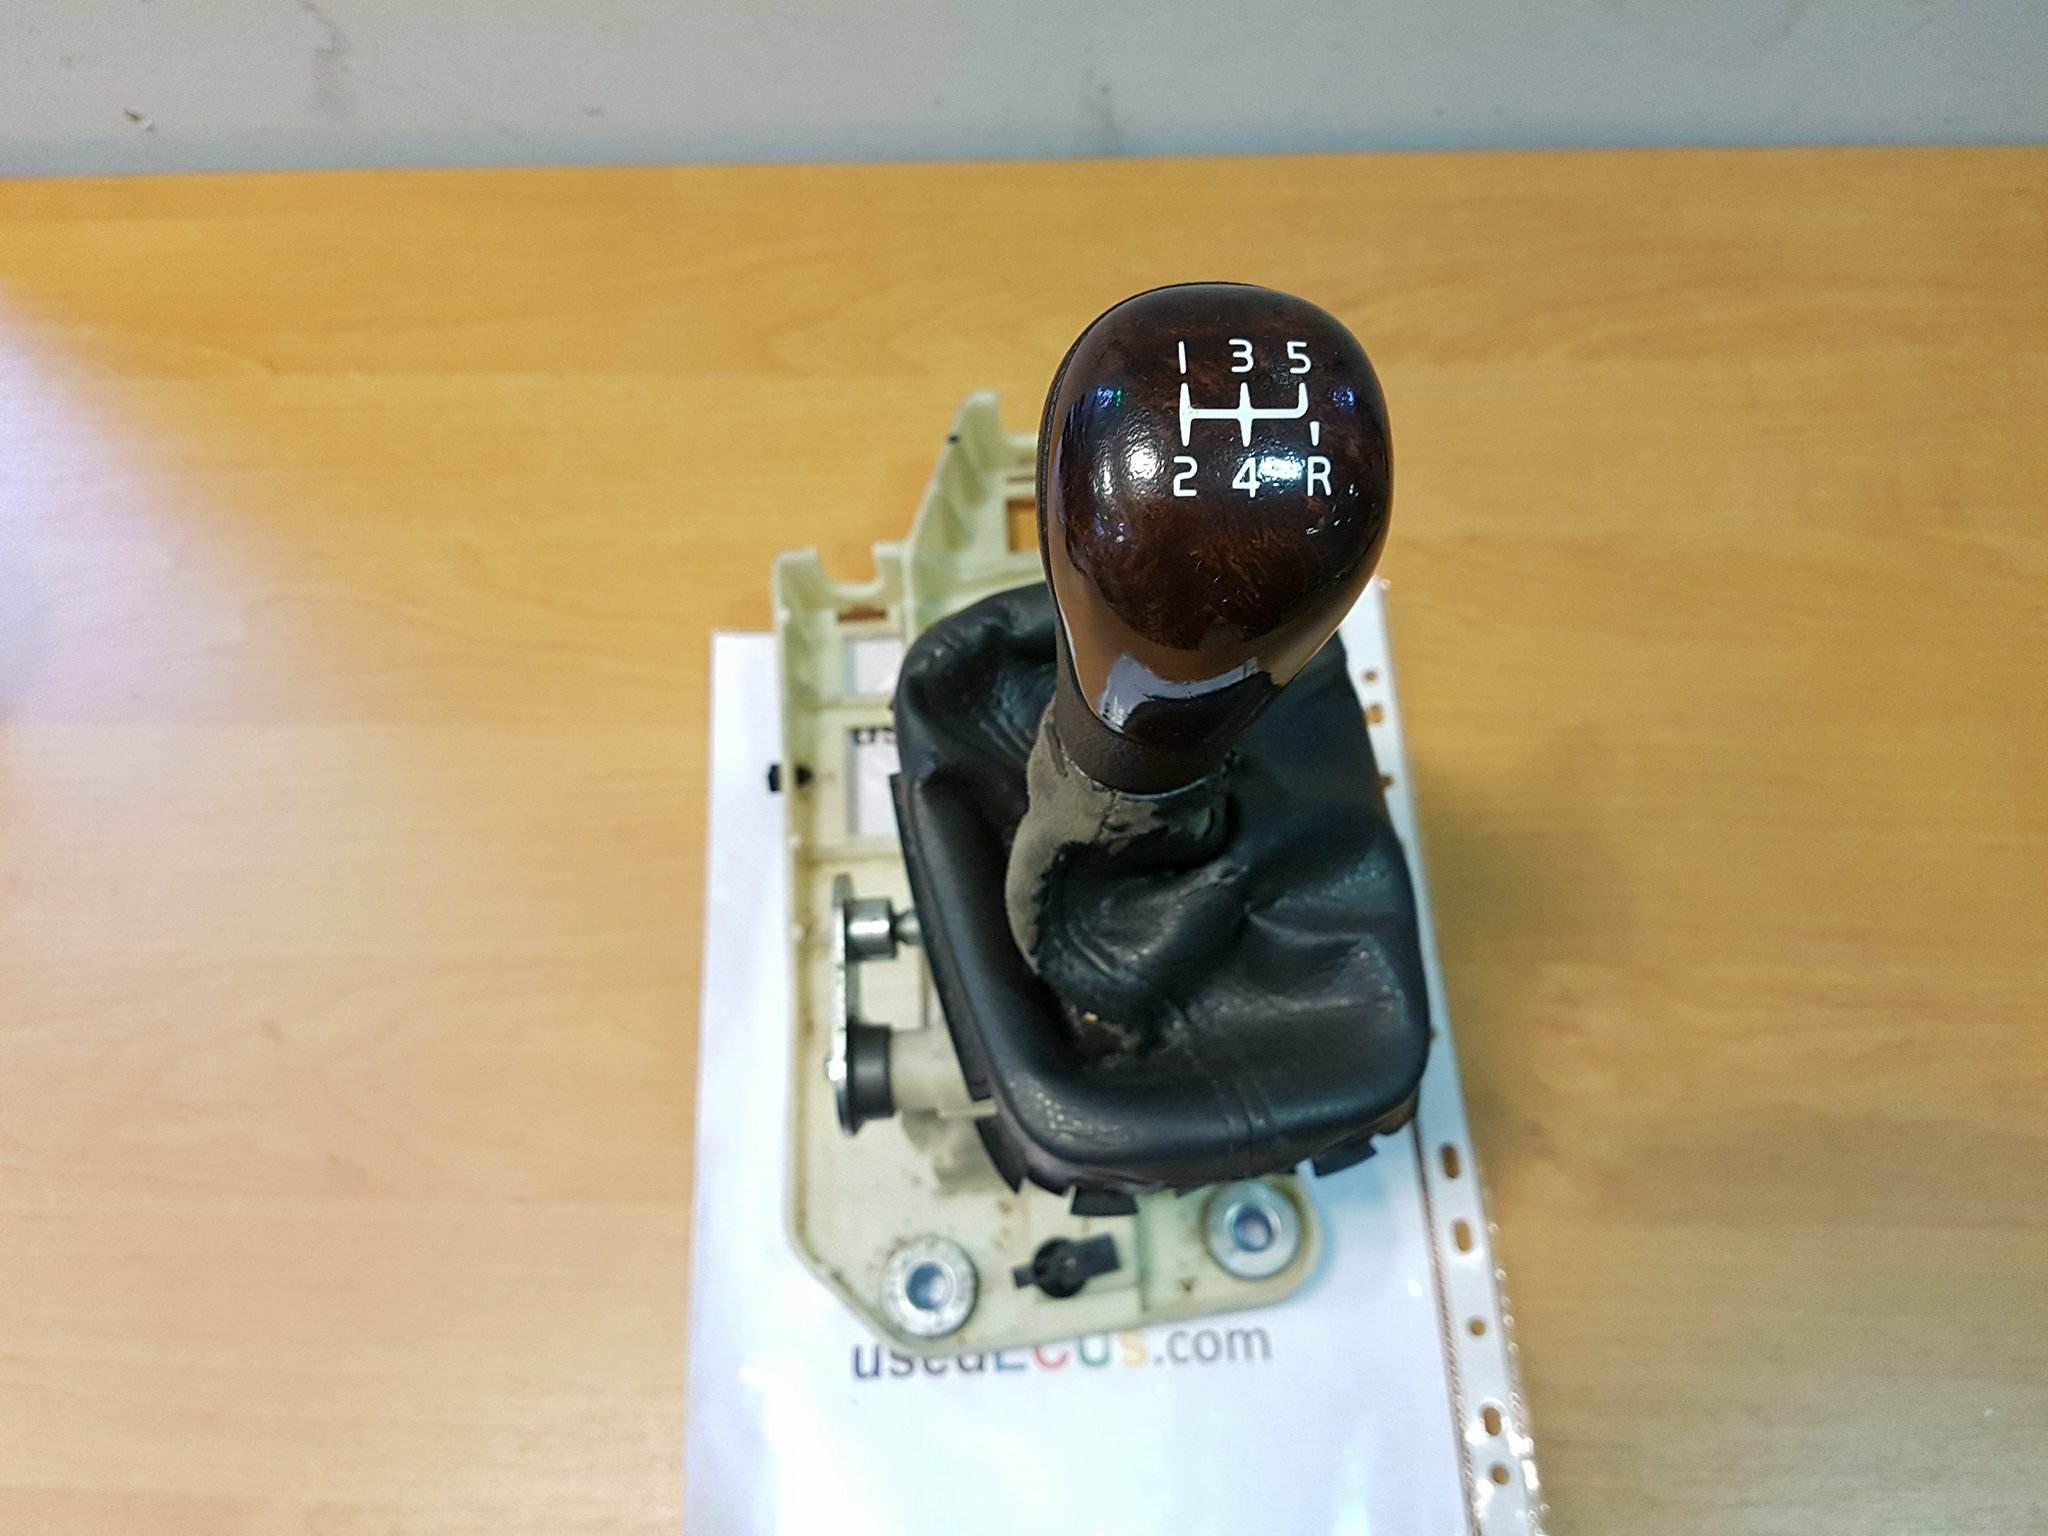 volvo s80 2004 manual gear stick lever shifter 8028100061 30646408 rh usedecus com 2004 volvo s80 repair manual 2004 Volvo S80 Interior